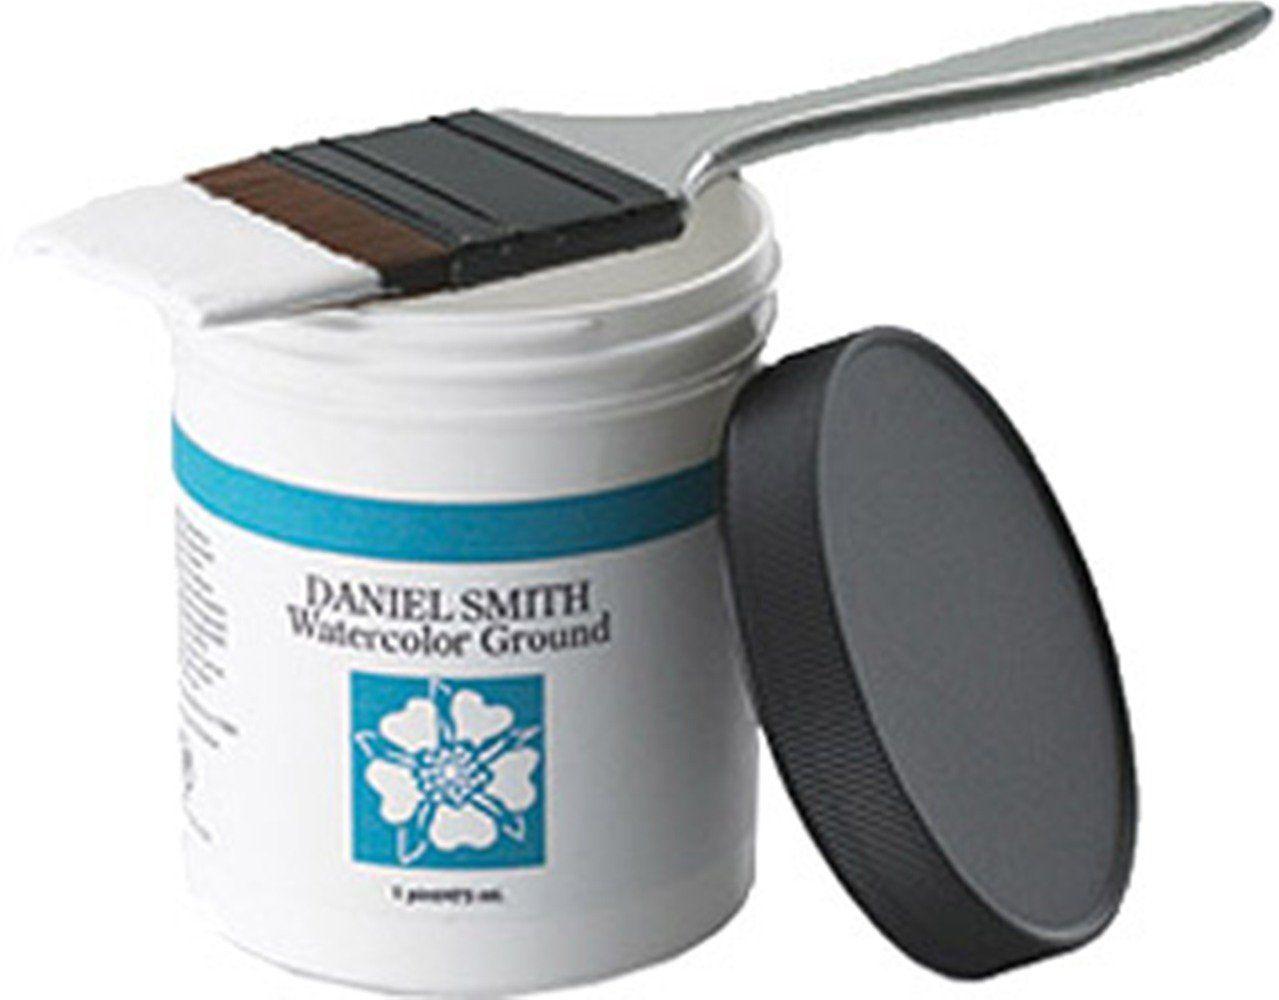 Doodlewash Review Daniel Smith Watercolor Grounds Watercolor